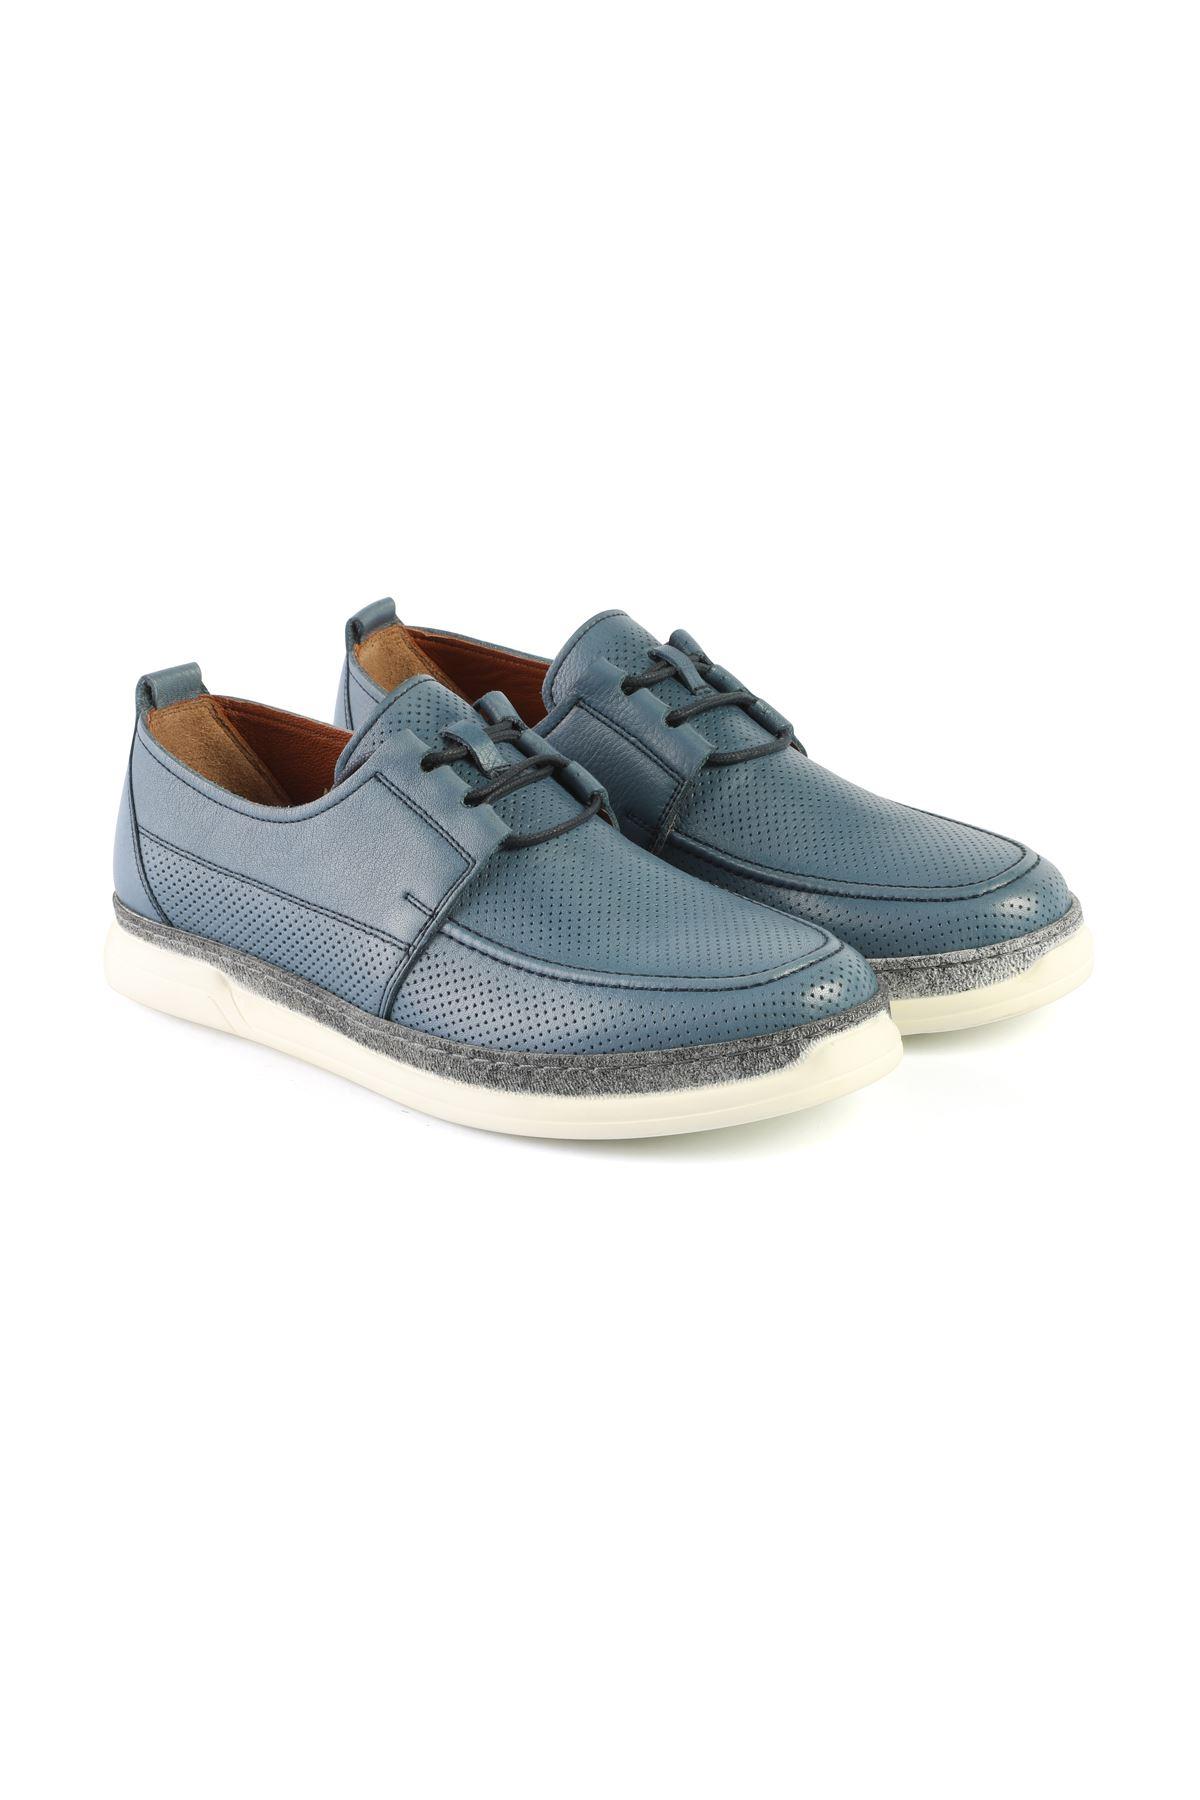 Libero L3418 Blue Loafer Shoes